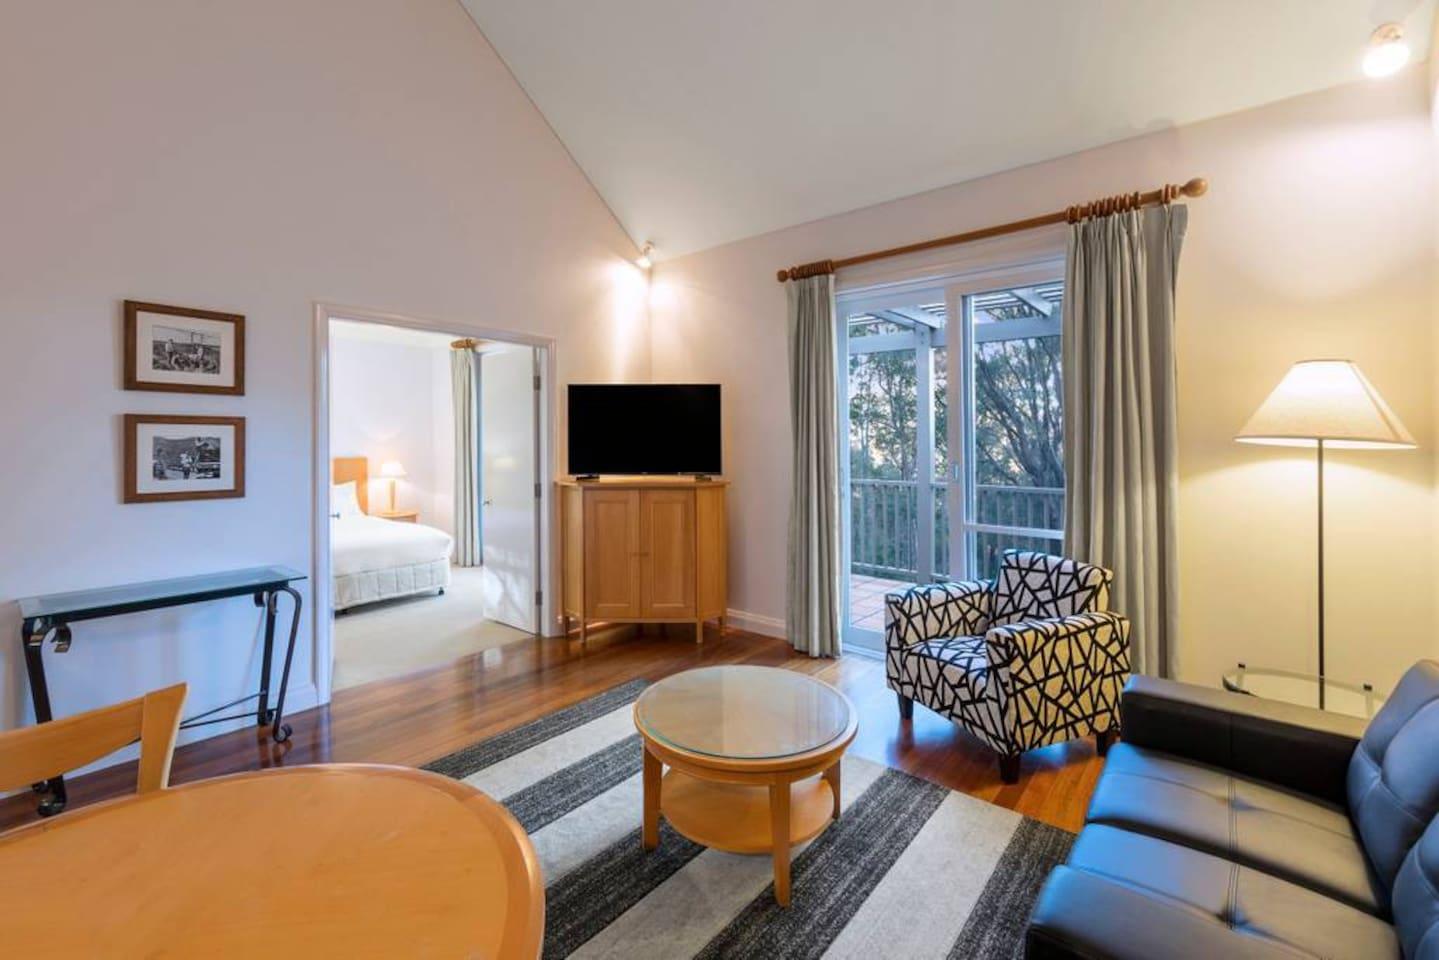 1 Bedroom Villa: Living room with TV